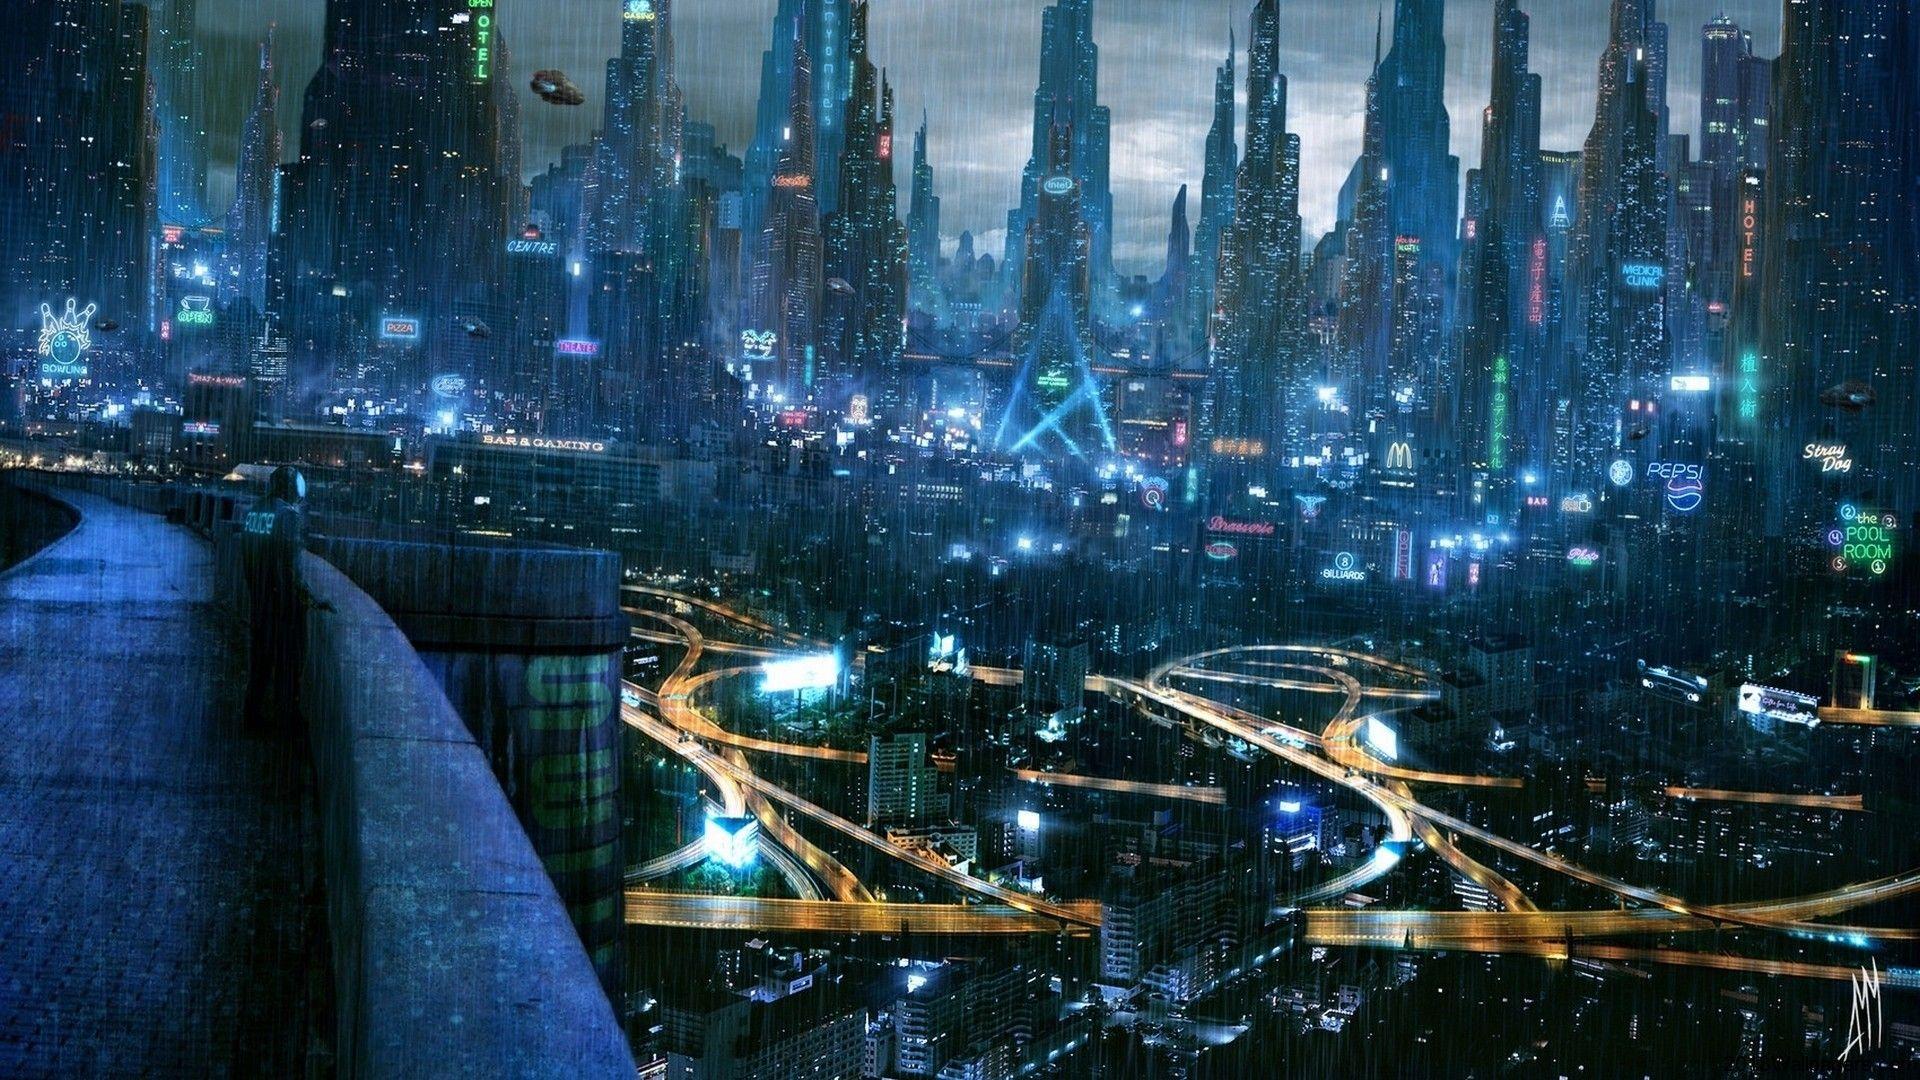 4k Futuristic Wallpaper Google Search Futuristic City Cyberpunk City Sci Fi City